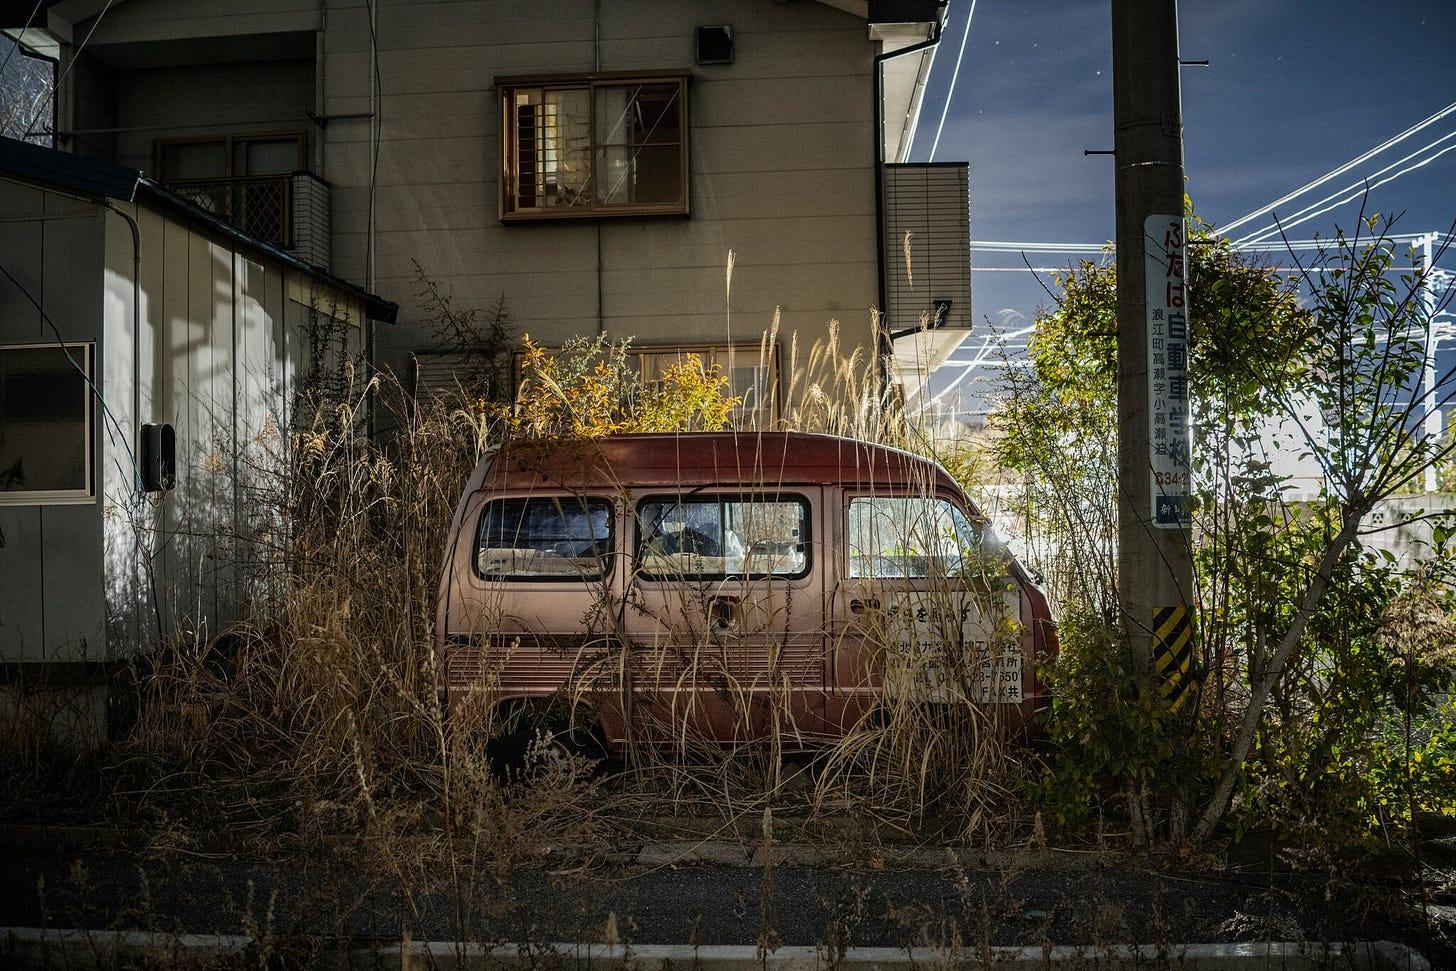 Photo of an overgrown abandoned minivan in Fukushima Japan.